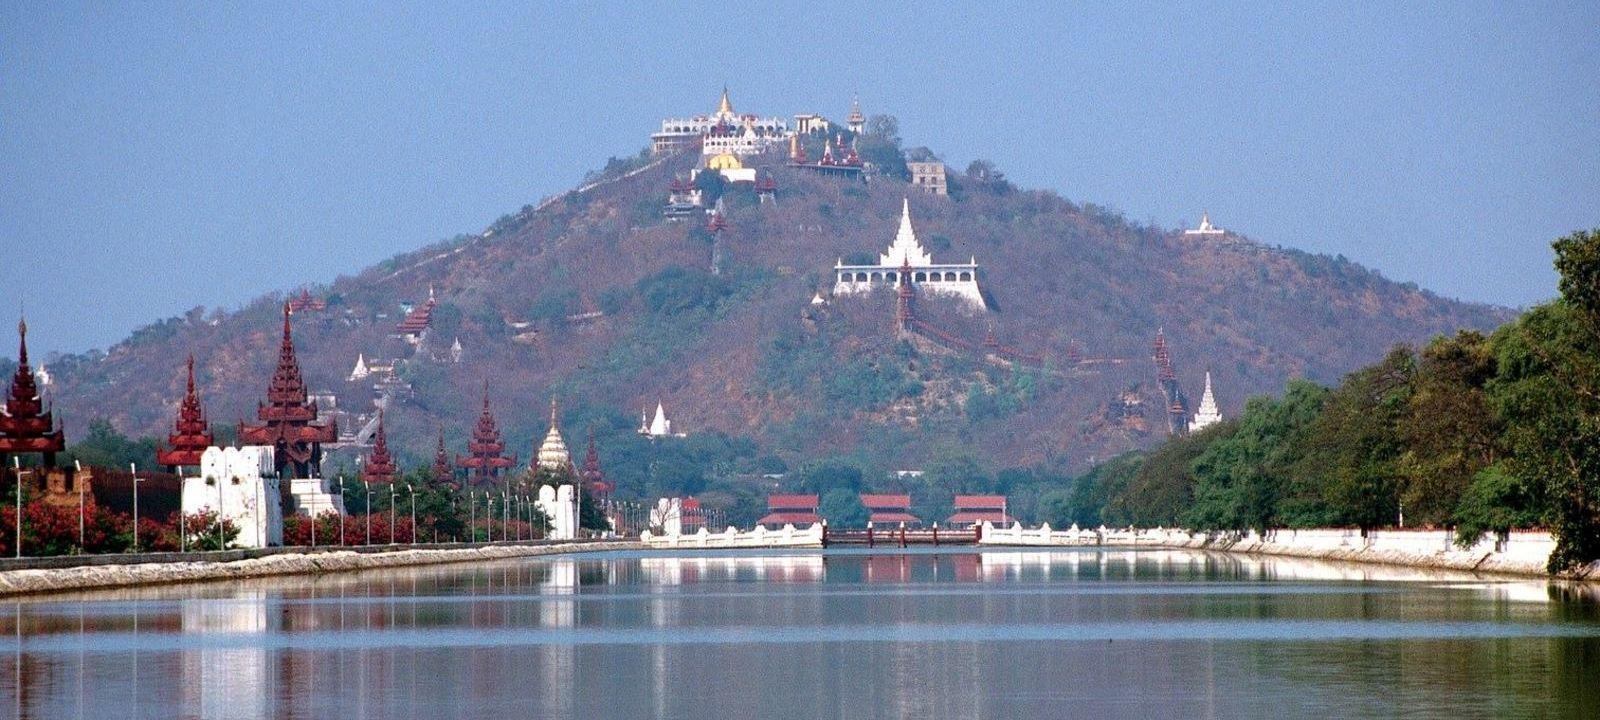 Mandalay, un âge d'or